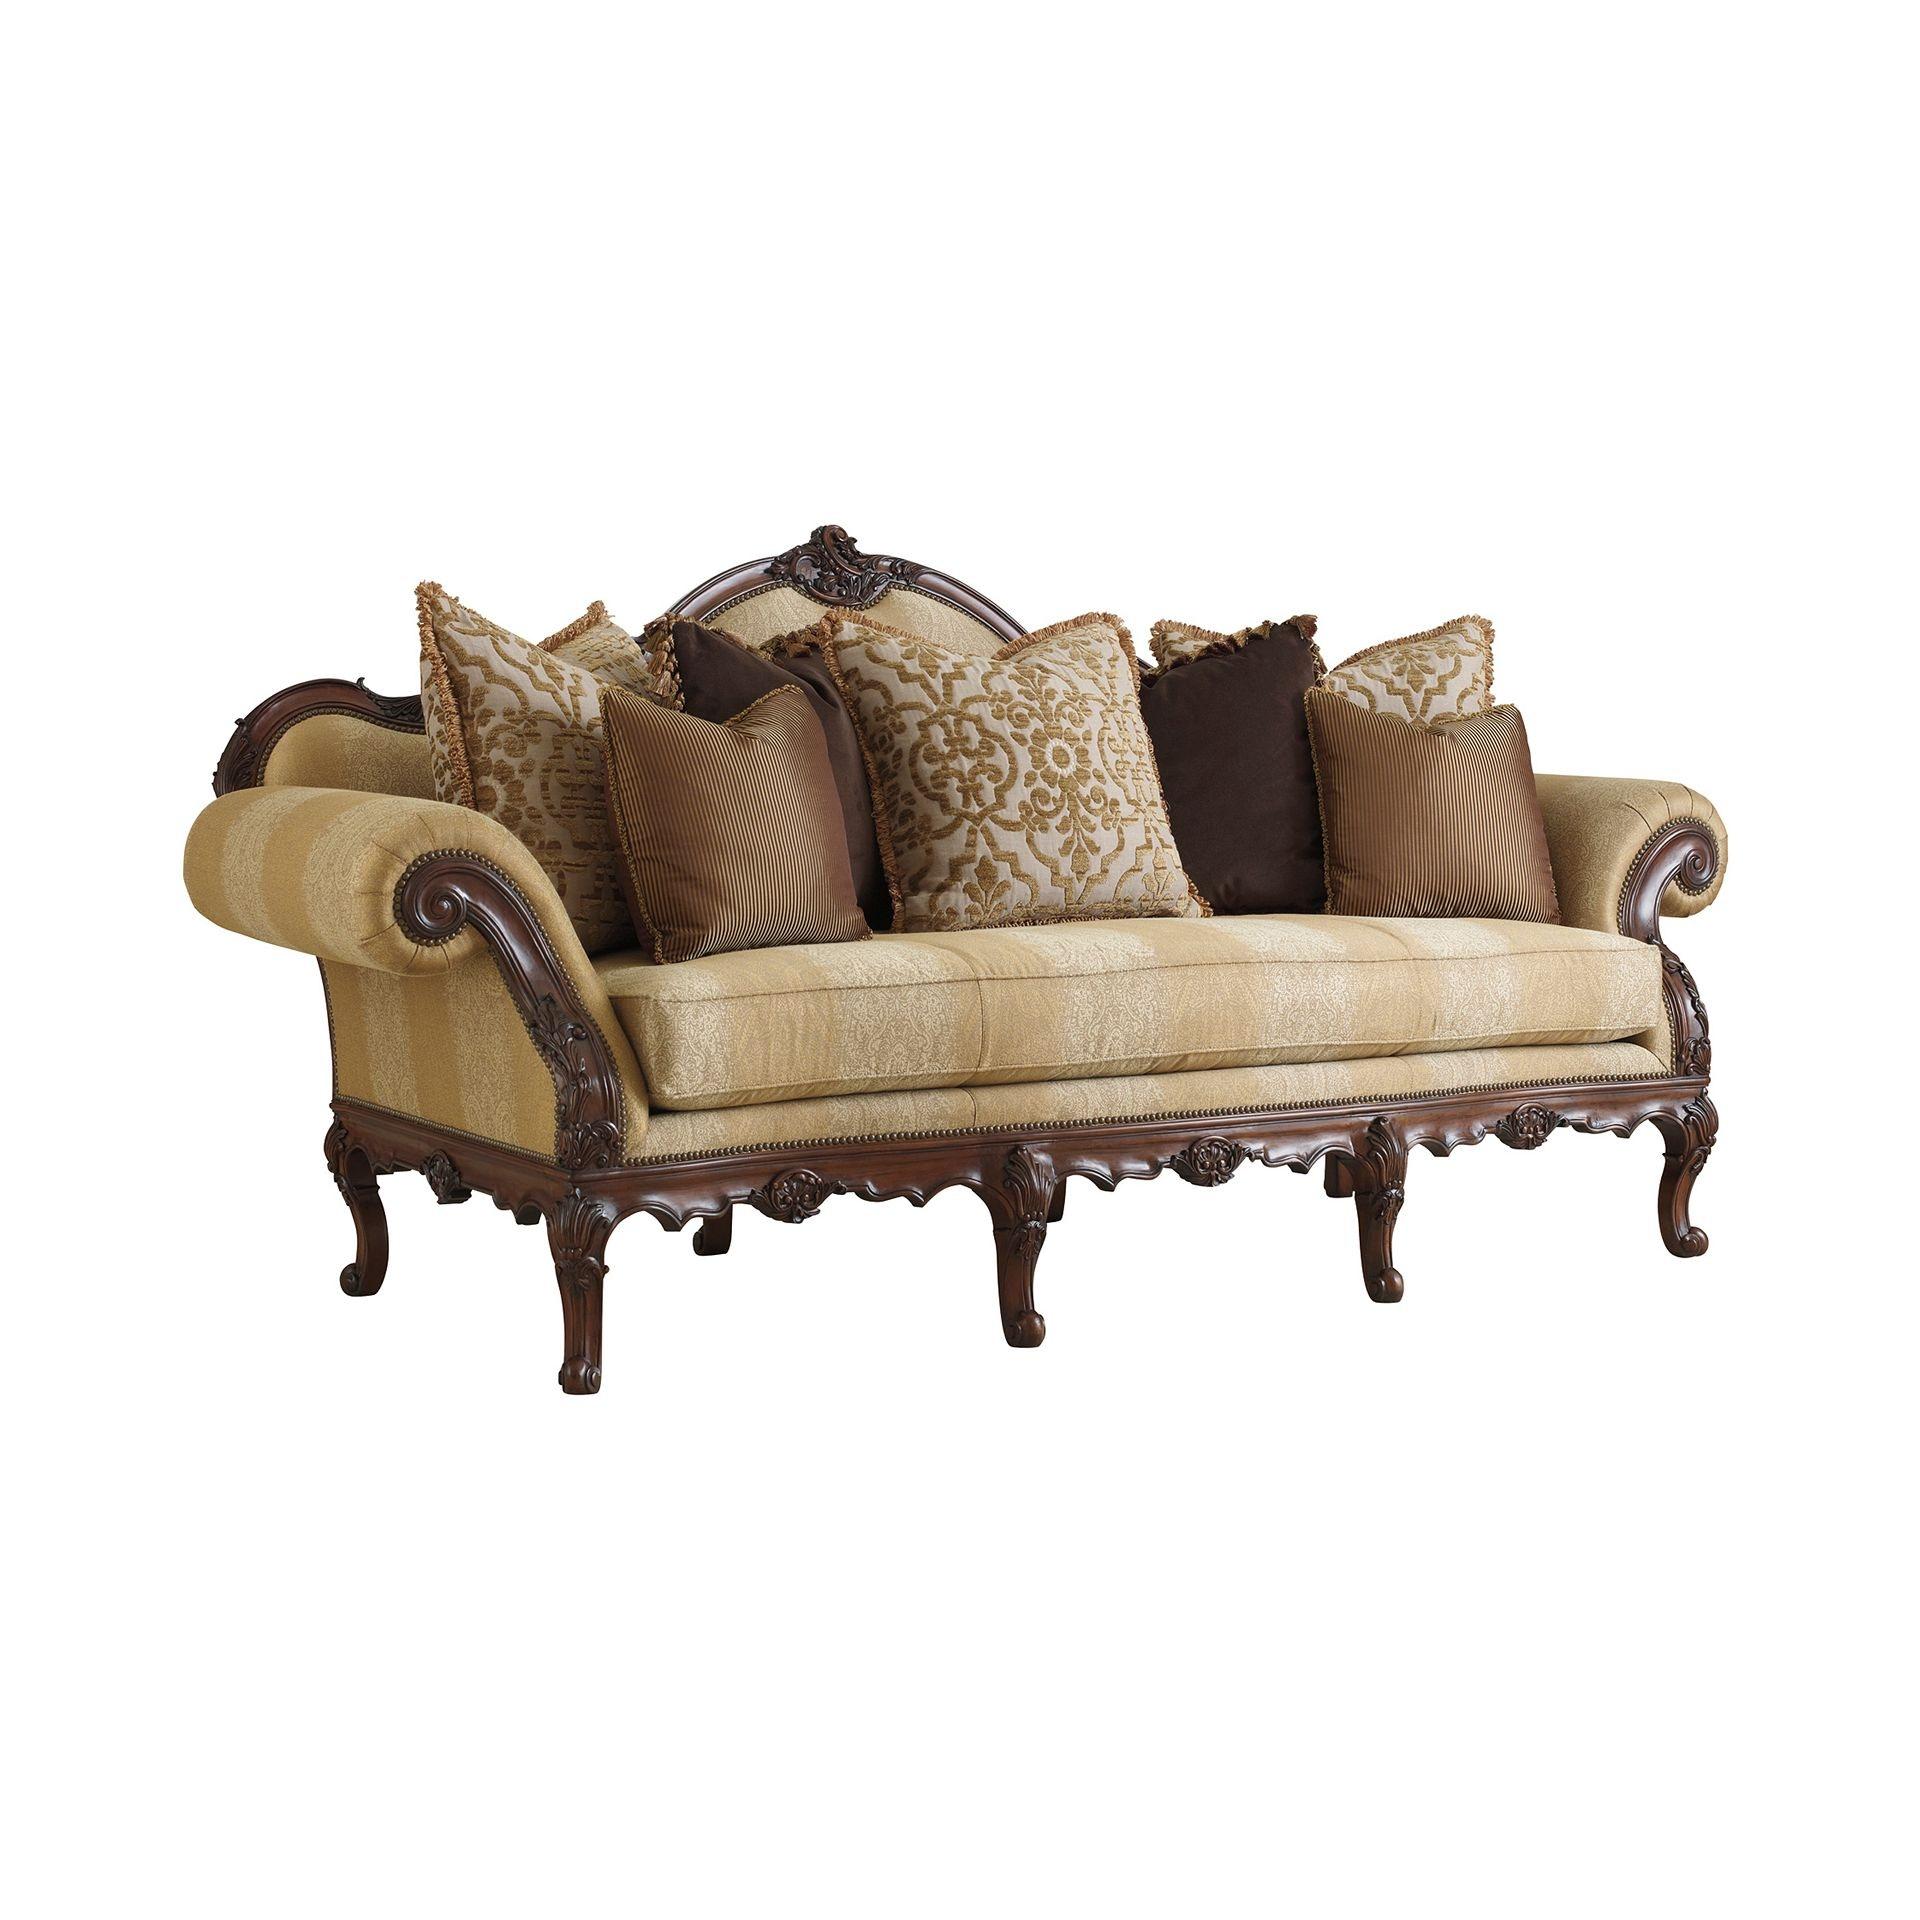 Henredon Furniture Henredon Upholstery Florence Sofa H1110 C